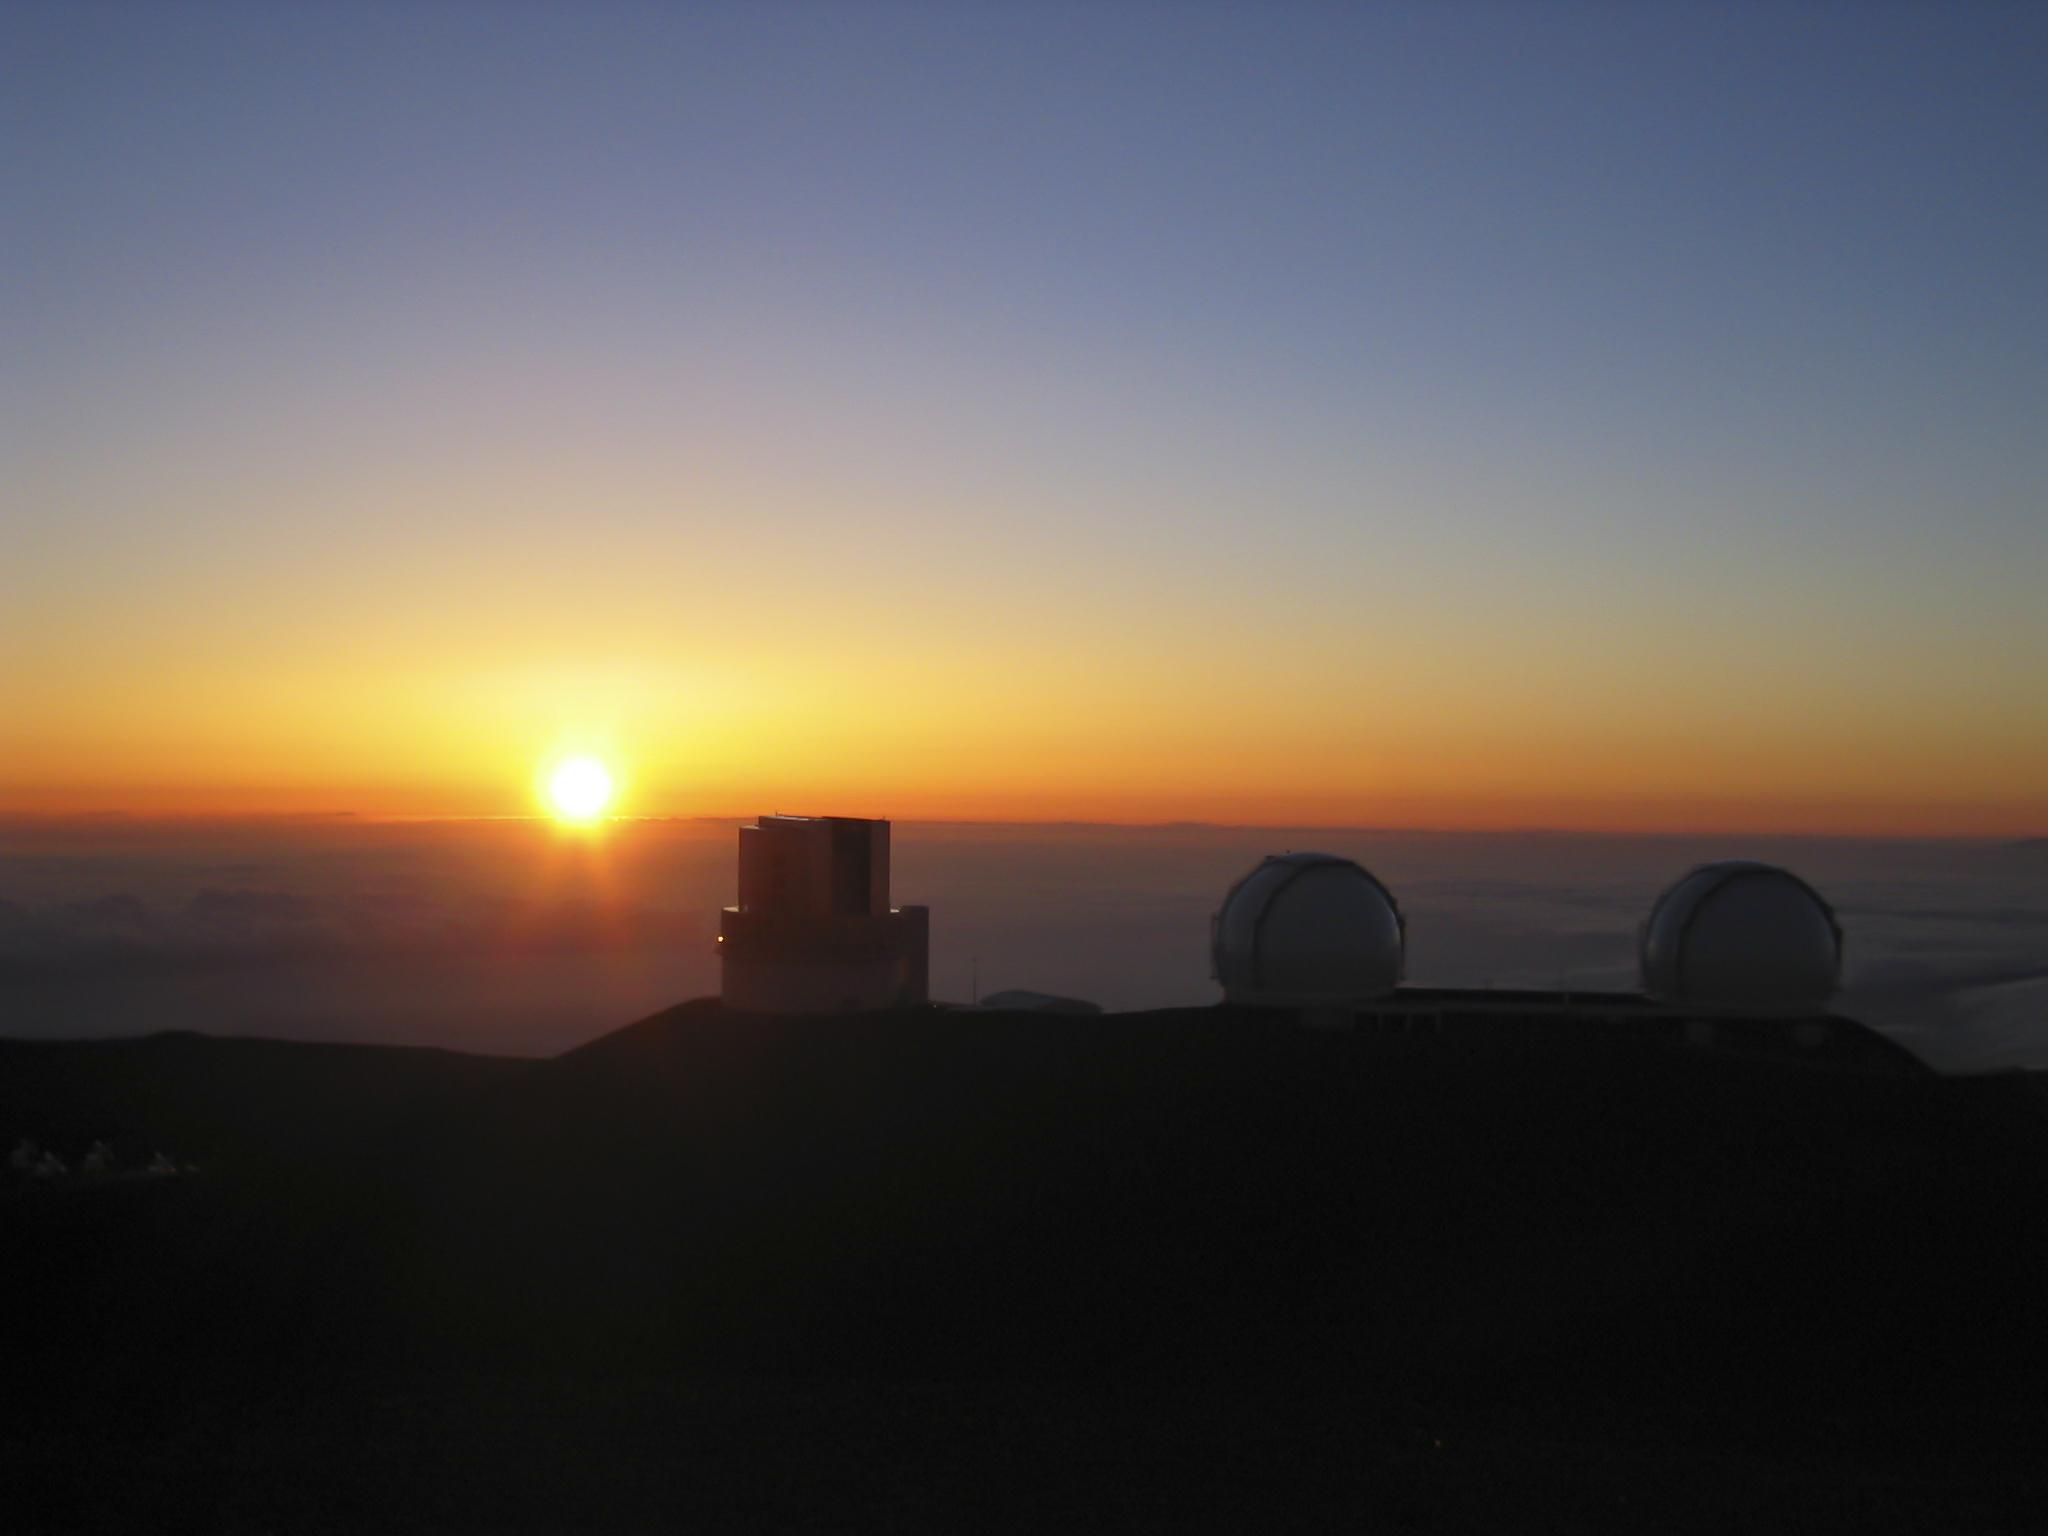 Keck Telescopes Sunset on Mauna Kea, Hawaii